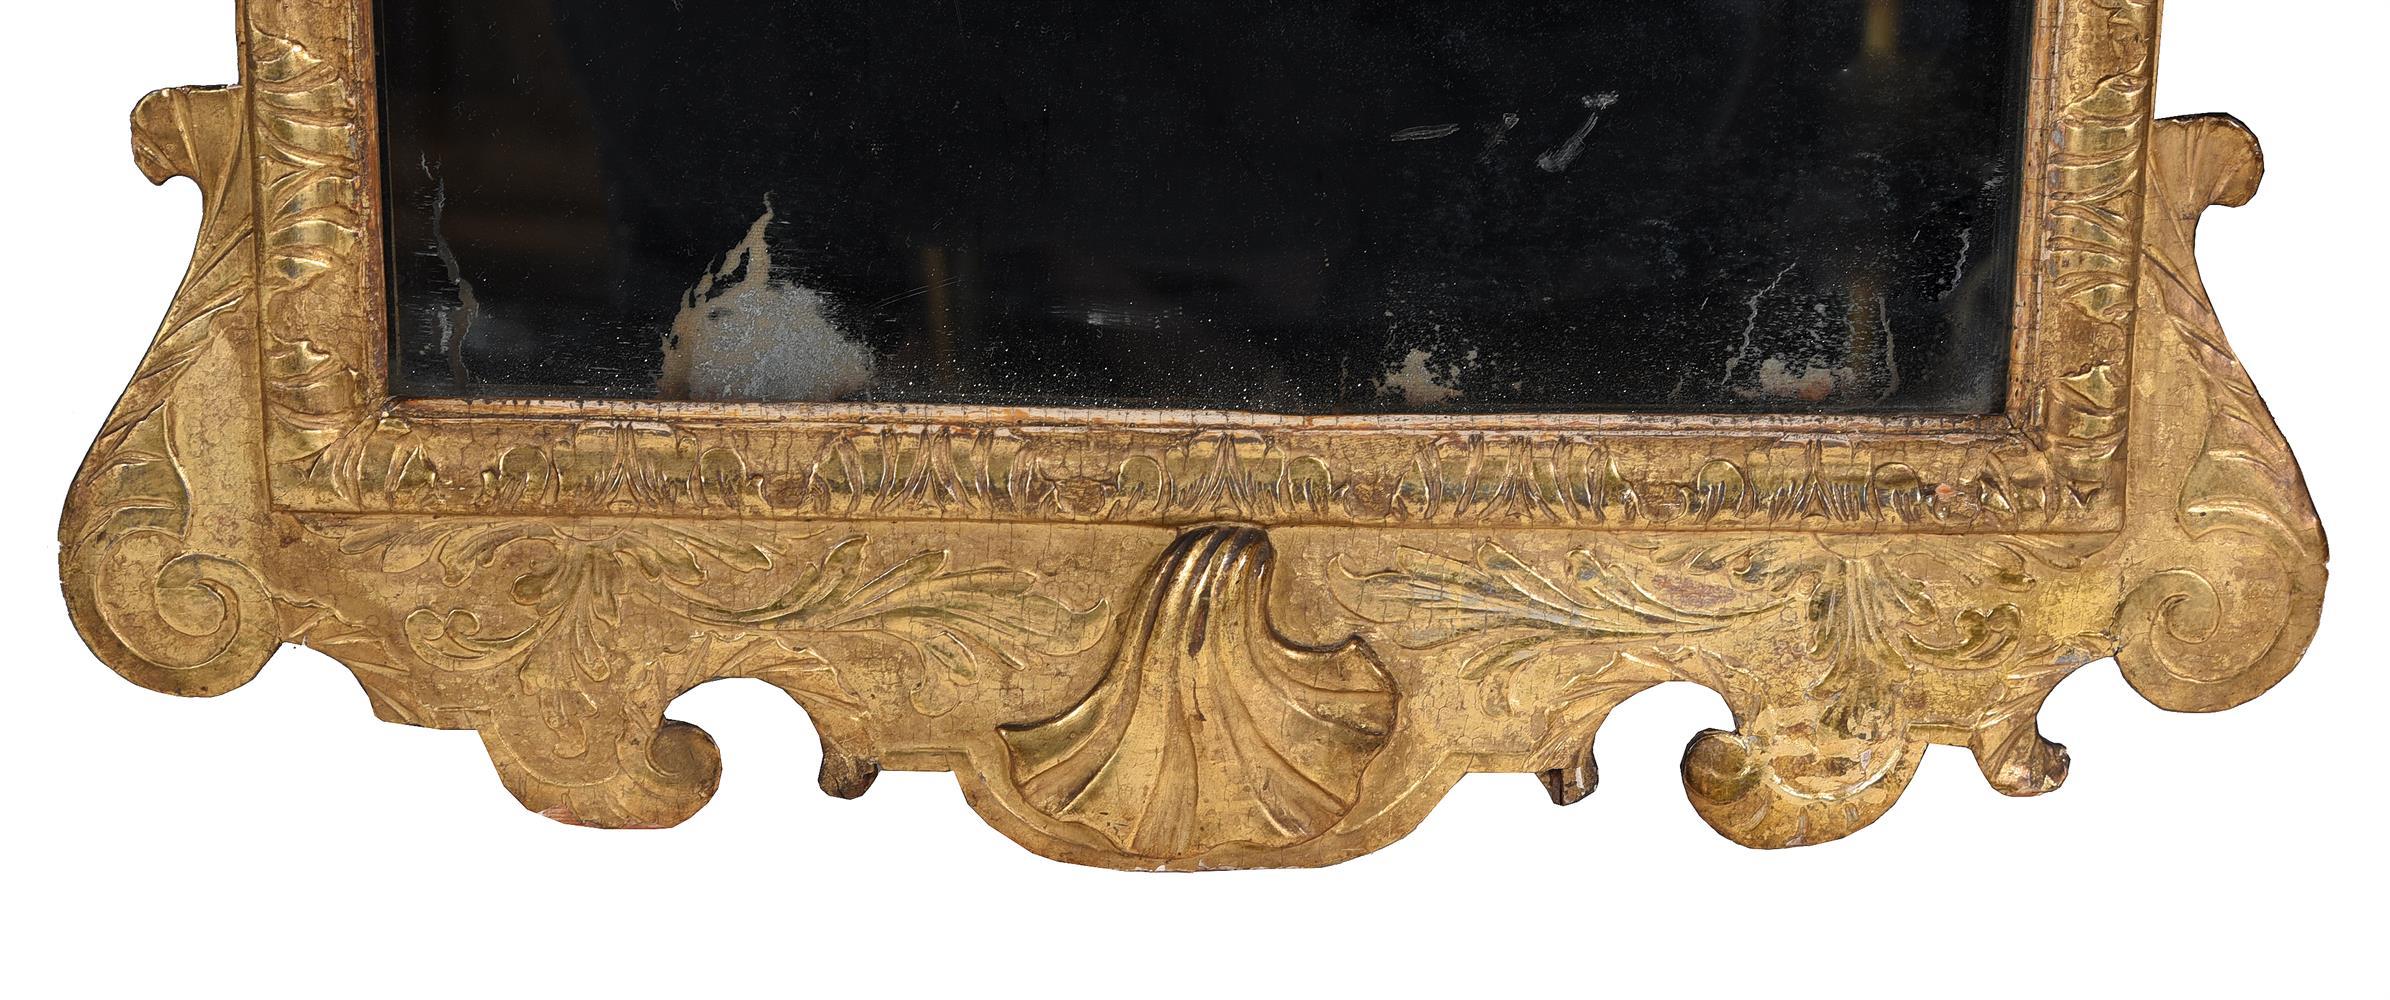 A GEORGE I GILTWOOD WALL MIRROR, CIRCA 1720 - Image 3 of 5